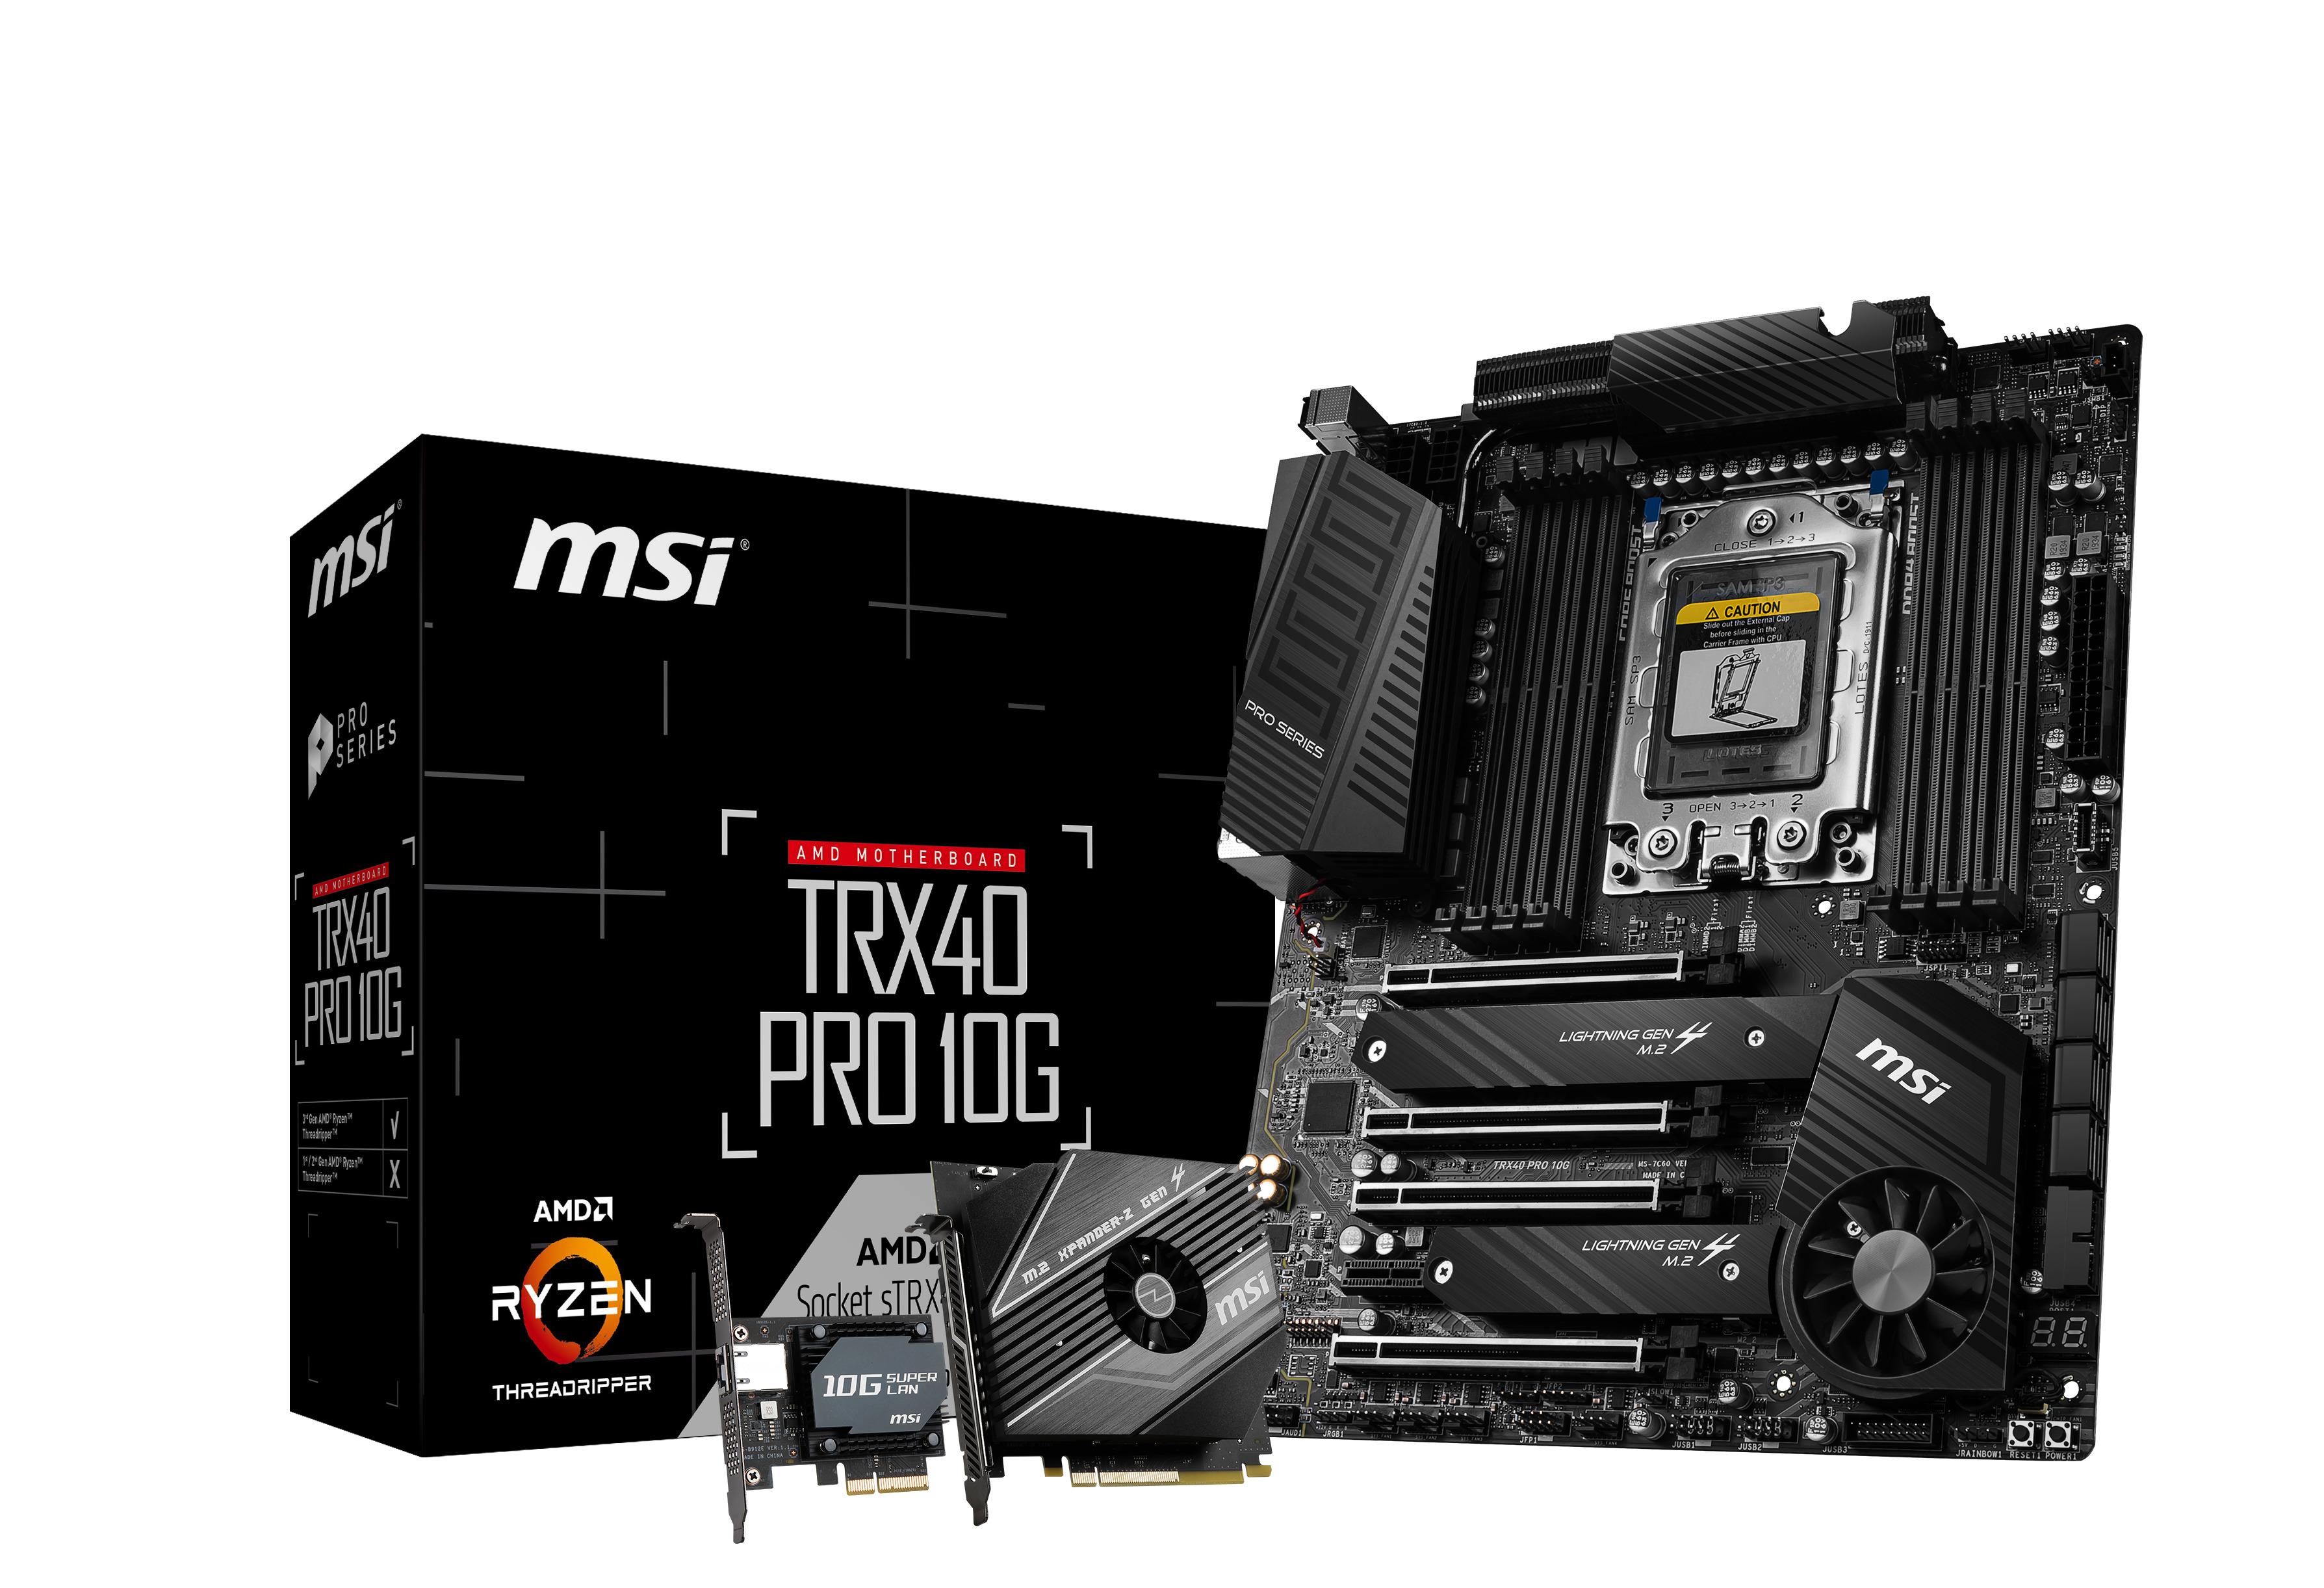 MSI - Motherboard MSI TRX40 PRO 10G